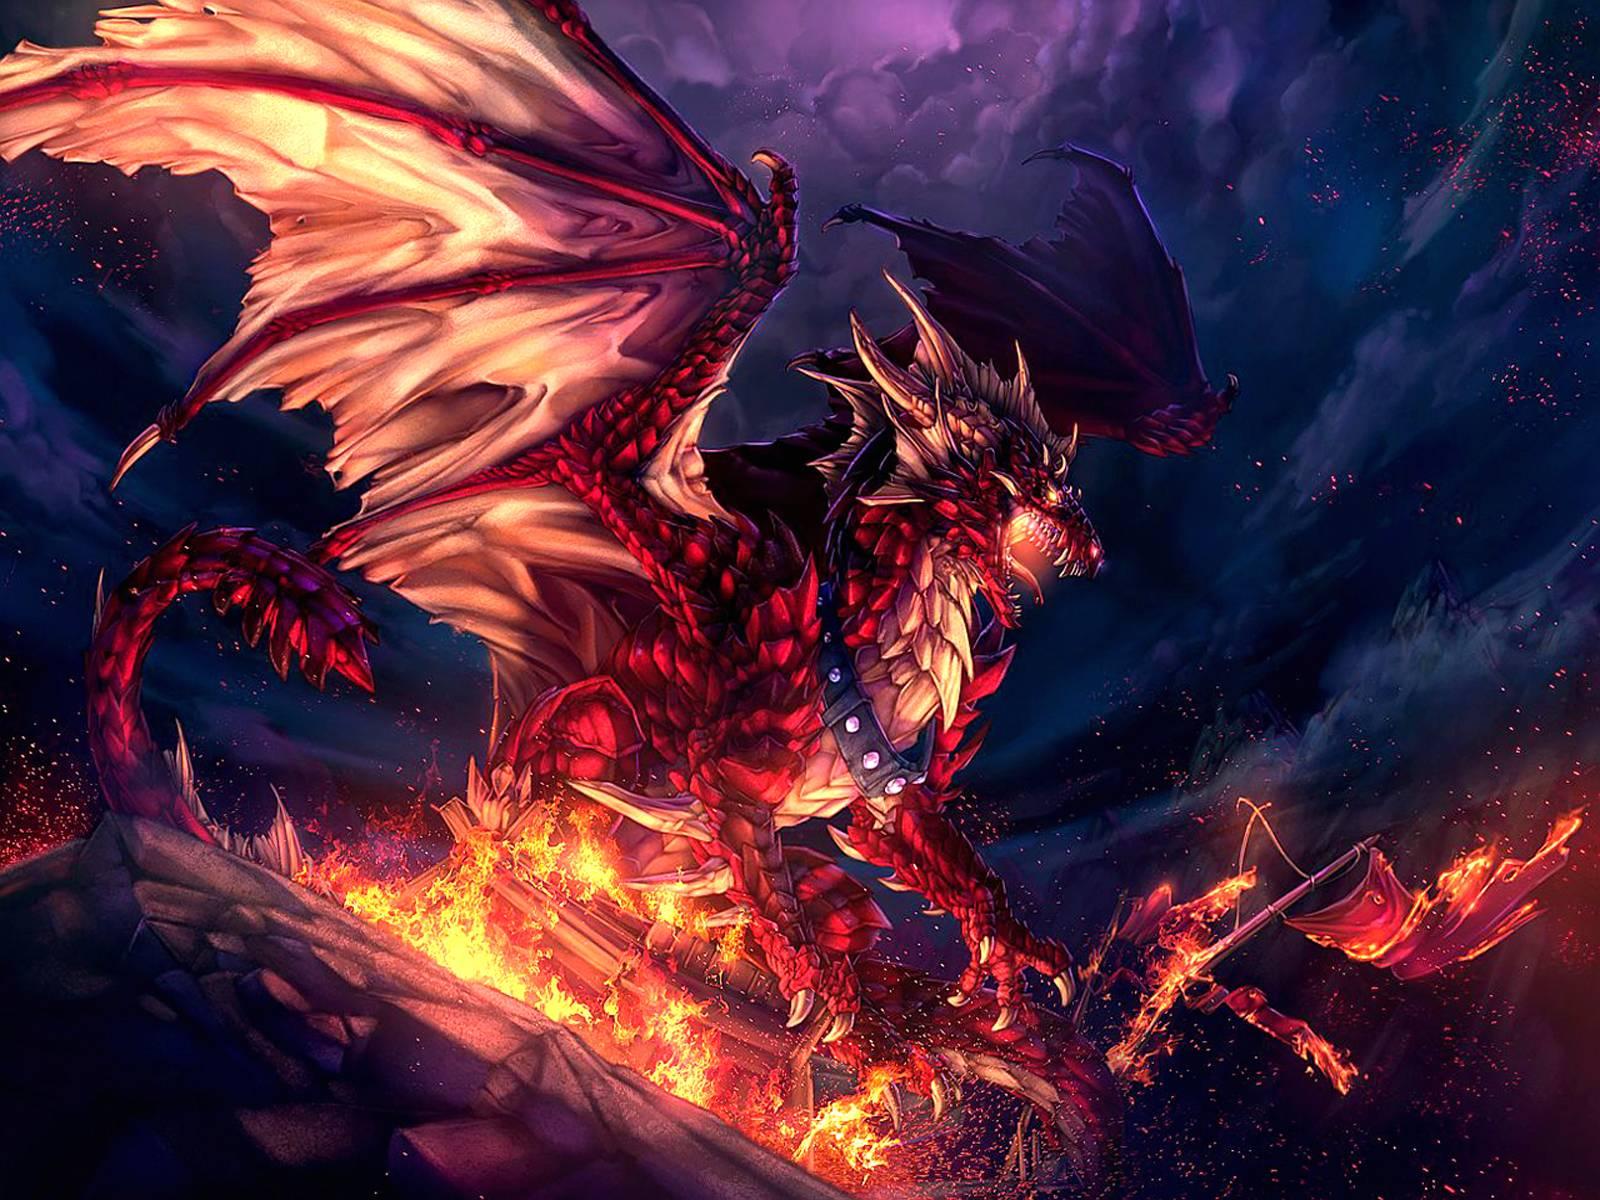 Cool Dragons Wallpapers - Wallpaper Cave